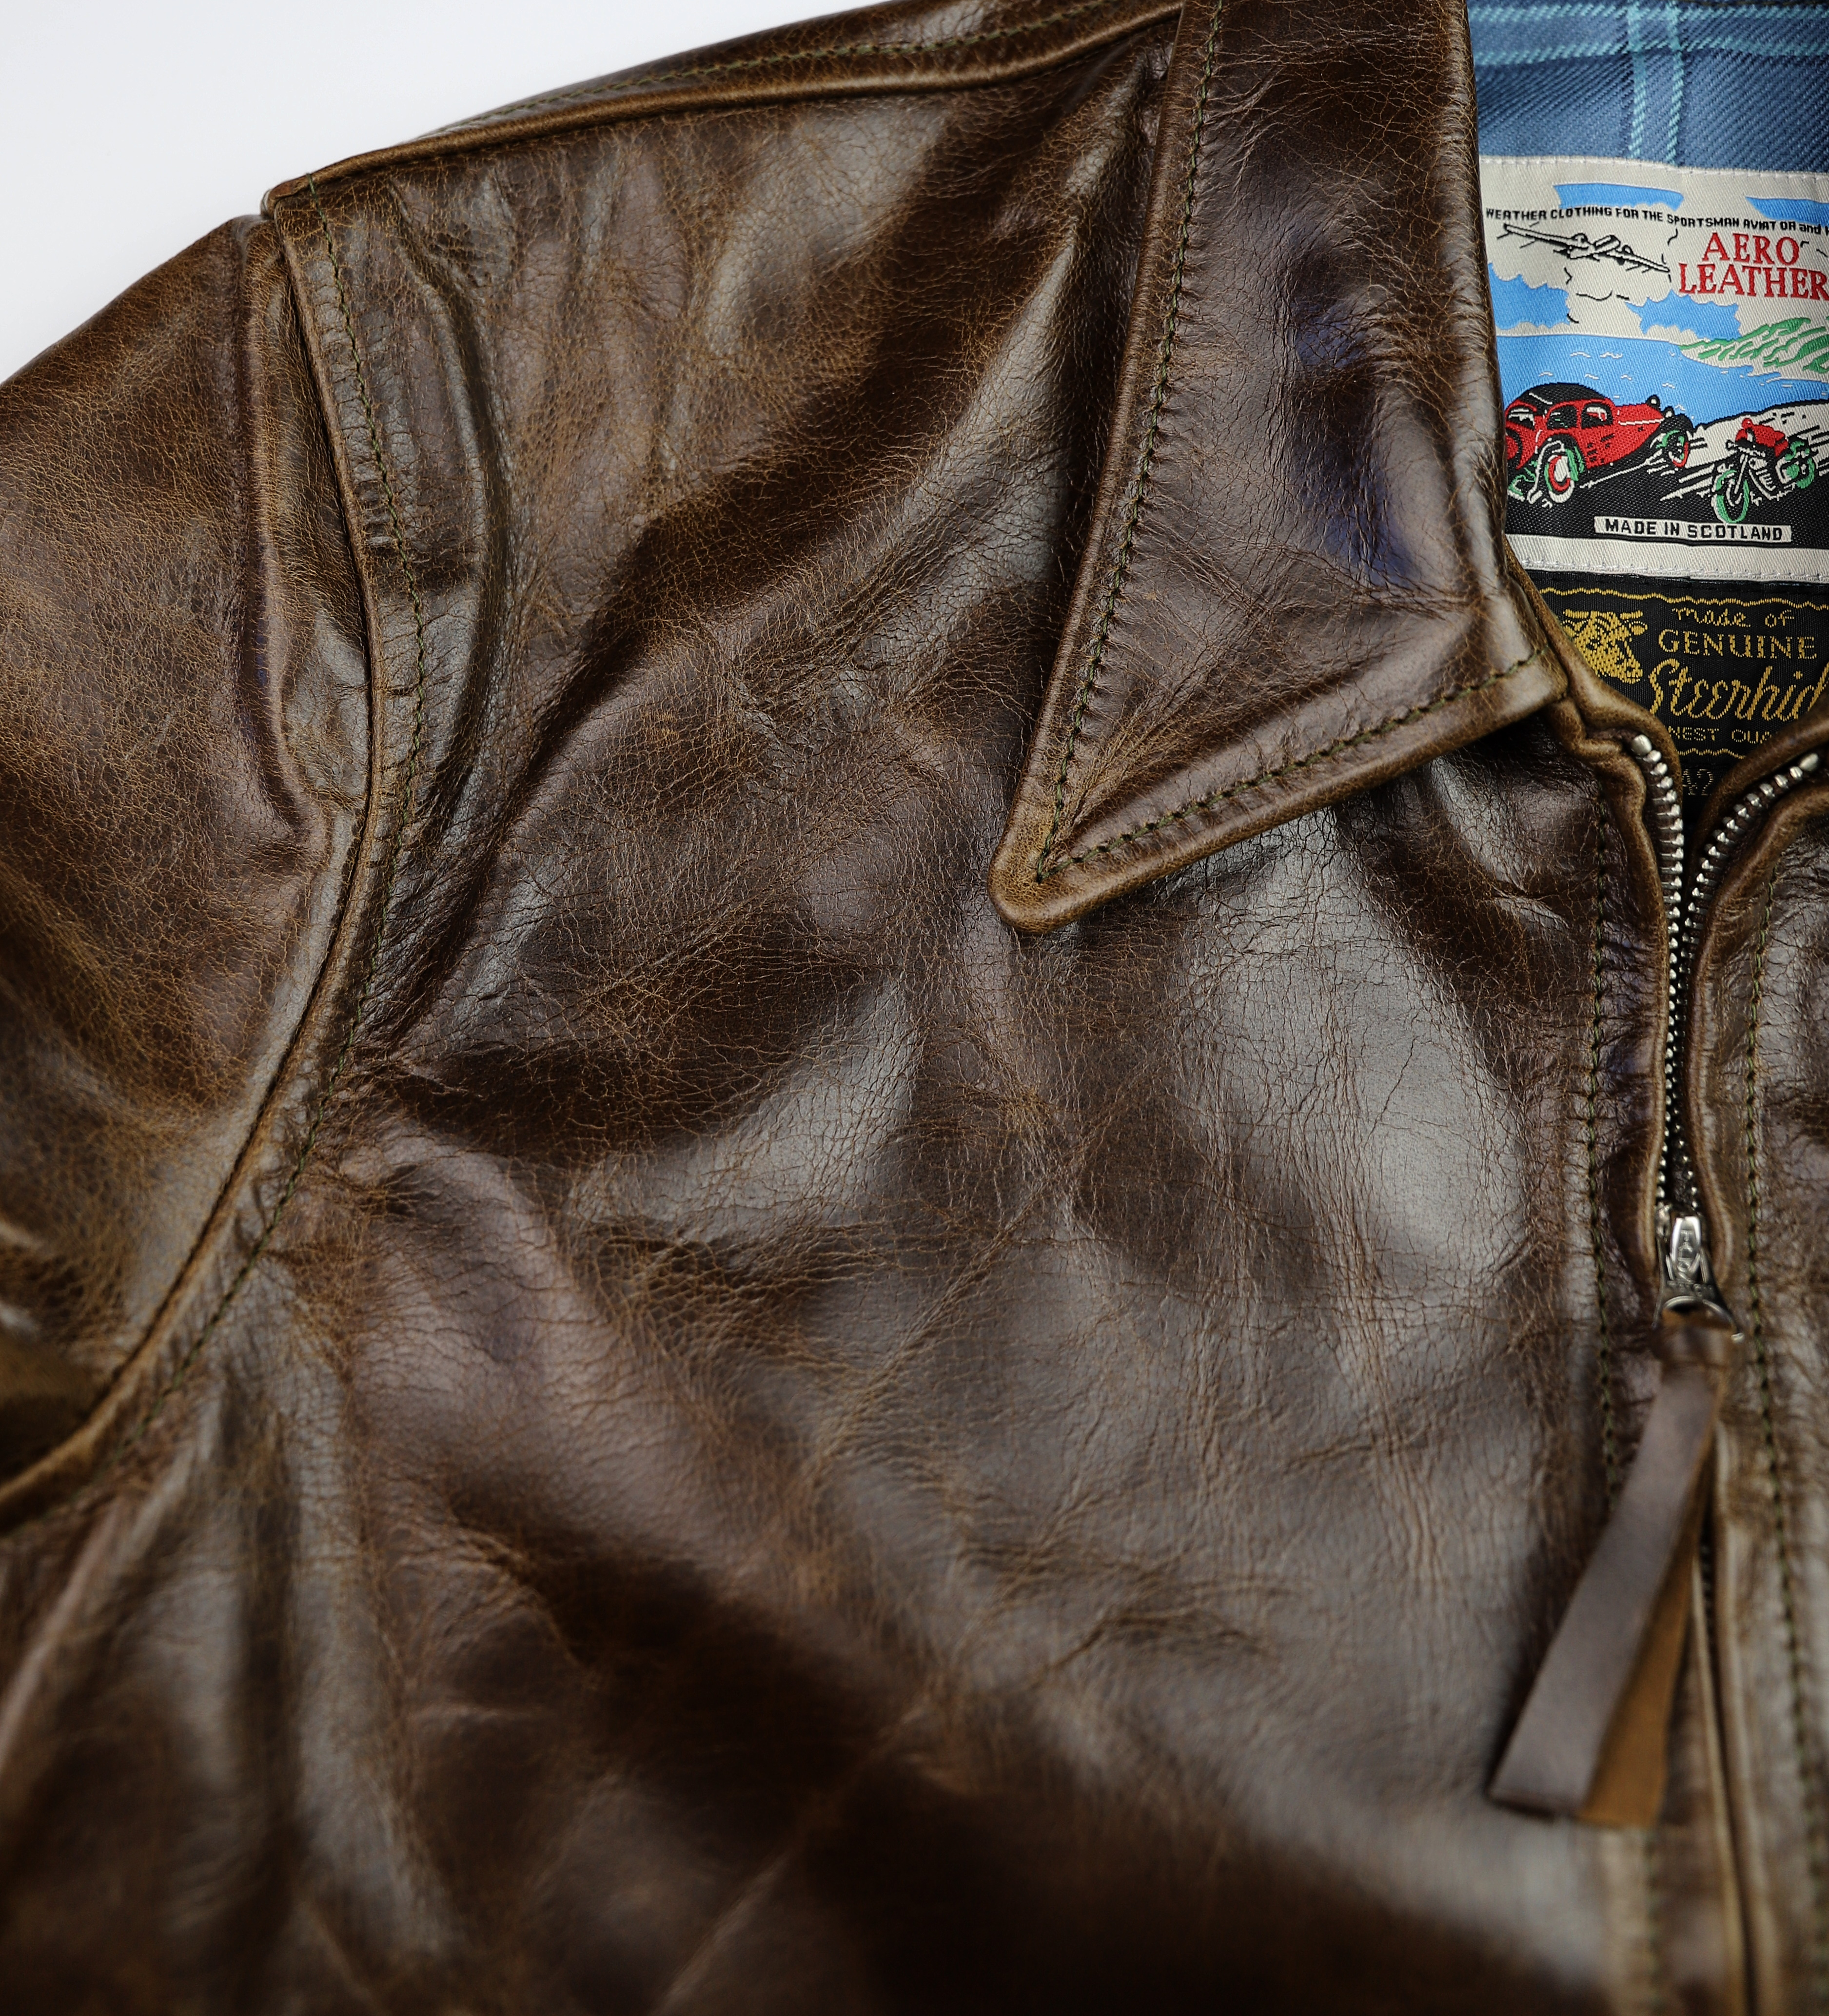 Aero Premier Highwayman Dark Maple Bainbridge TL7 chest grain.jpg